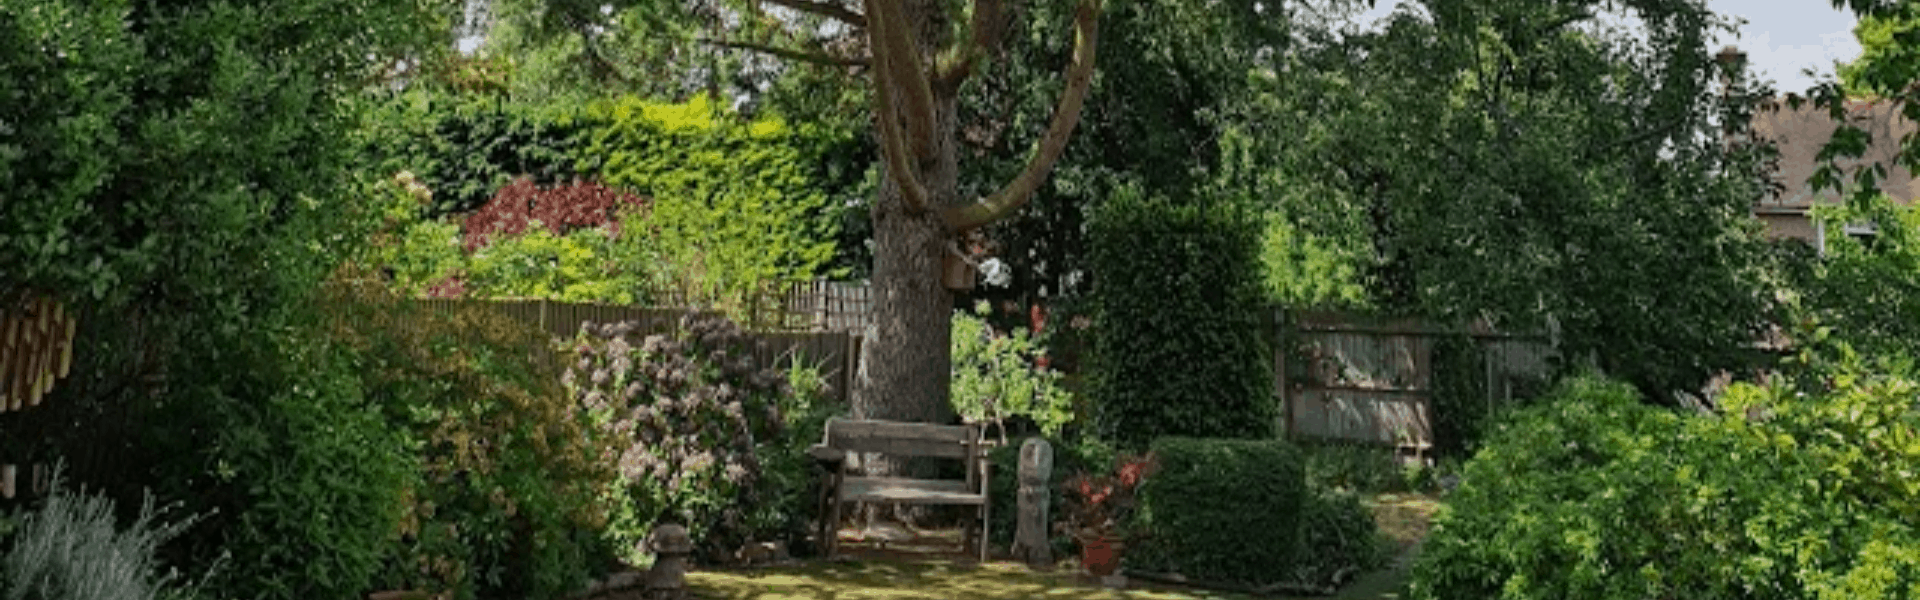 Magnificent Cedar Tree